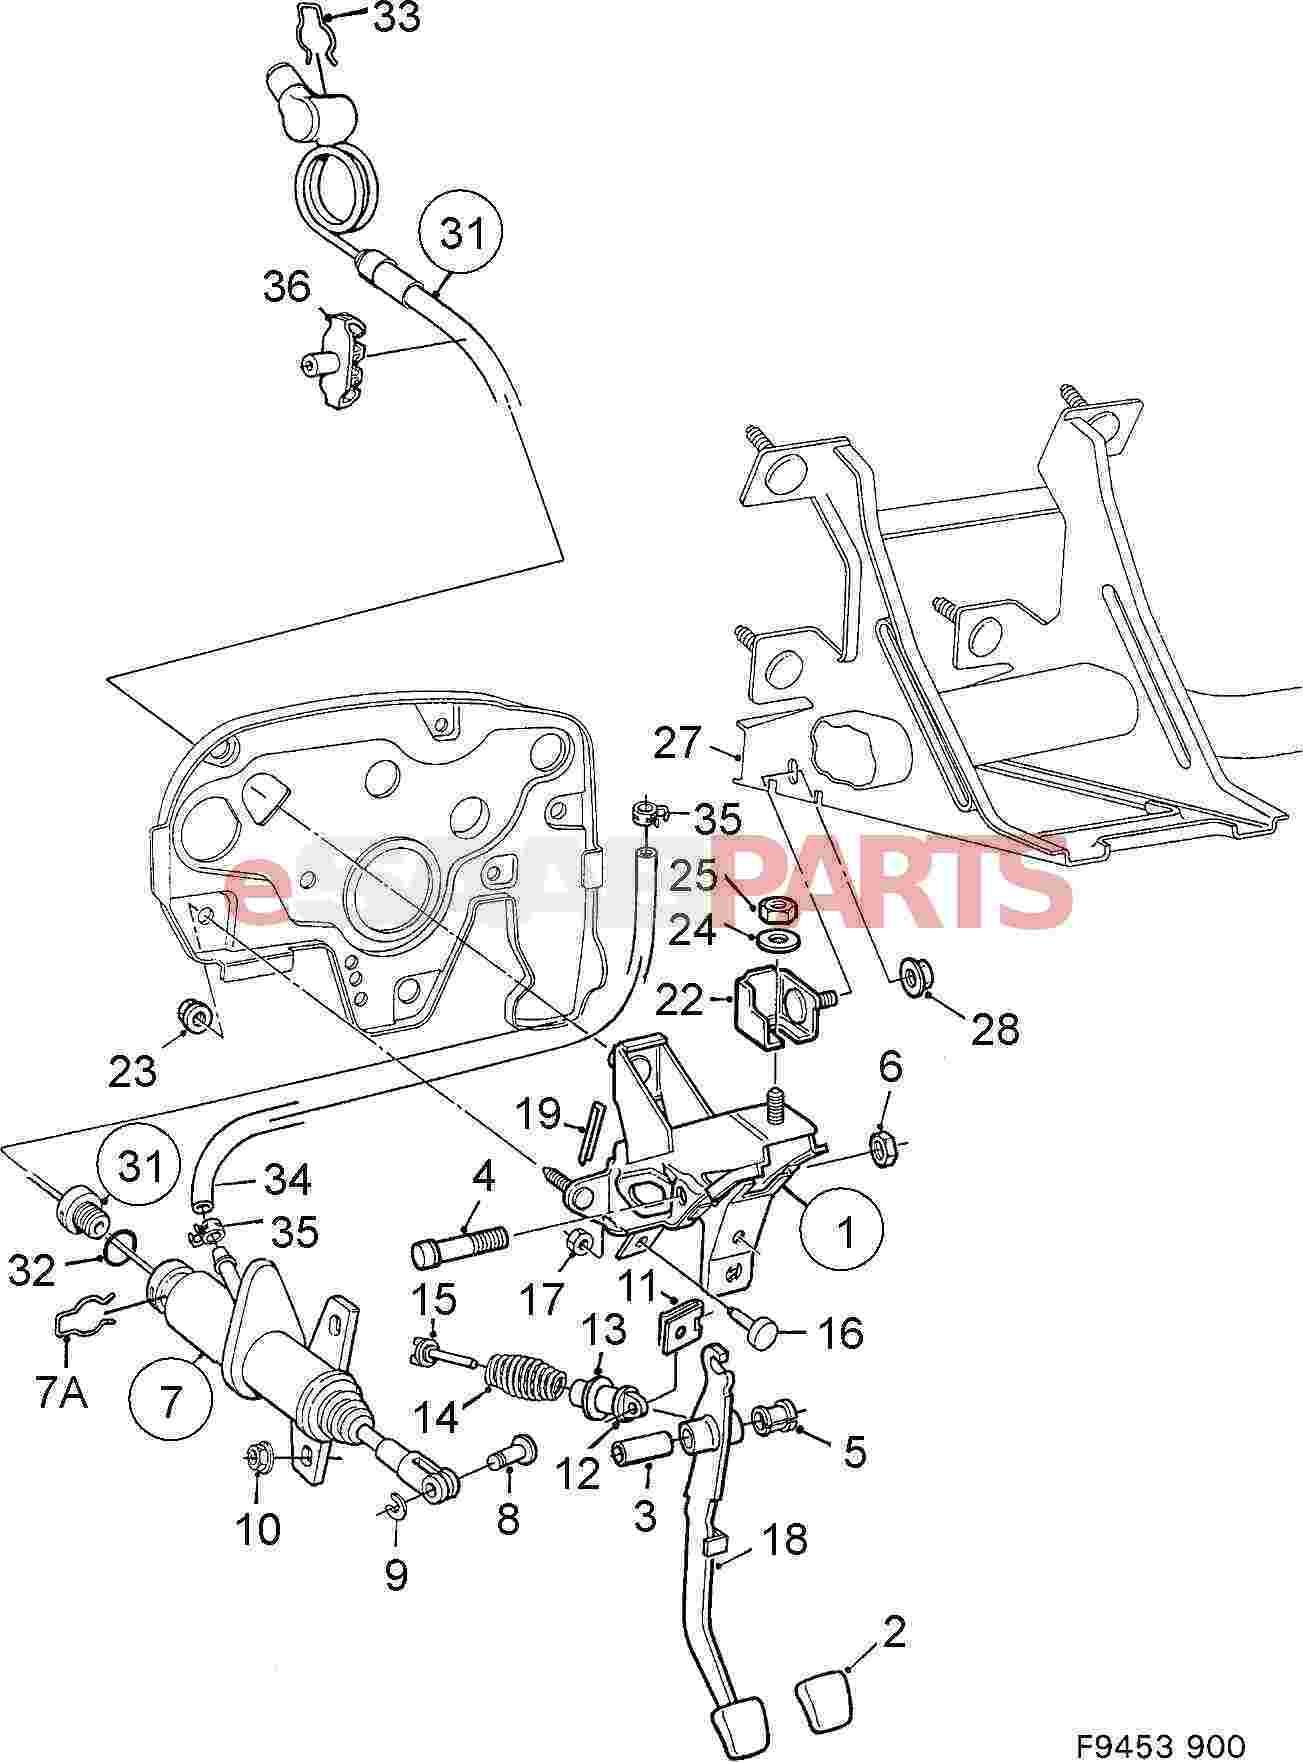 Saab 92x Wiring Diagram also Saab 9 3 Downstream O2 Location further Mazda 3 Wiring Harness also 98 Saab 9000 Engine Harness in addition Saab 9 3 Fog Lights Wiring Diagrams. on saab 900 wiring harness replacement